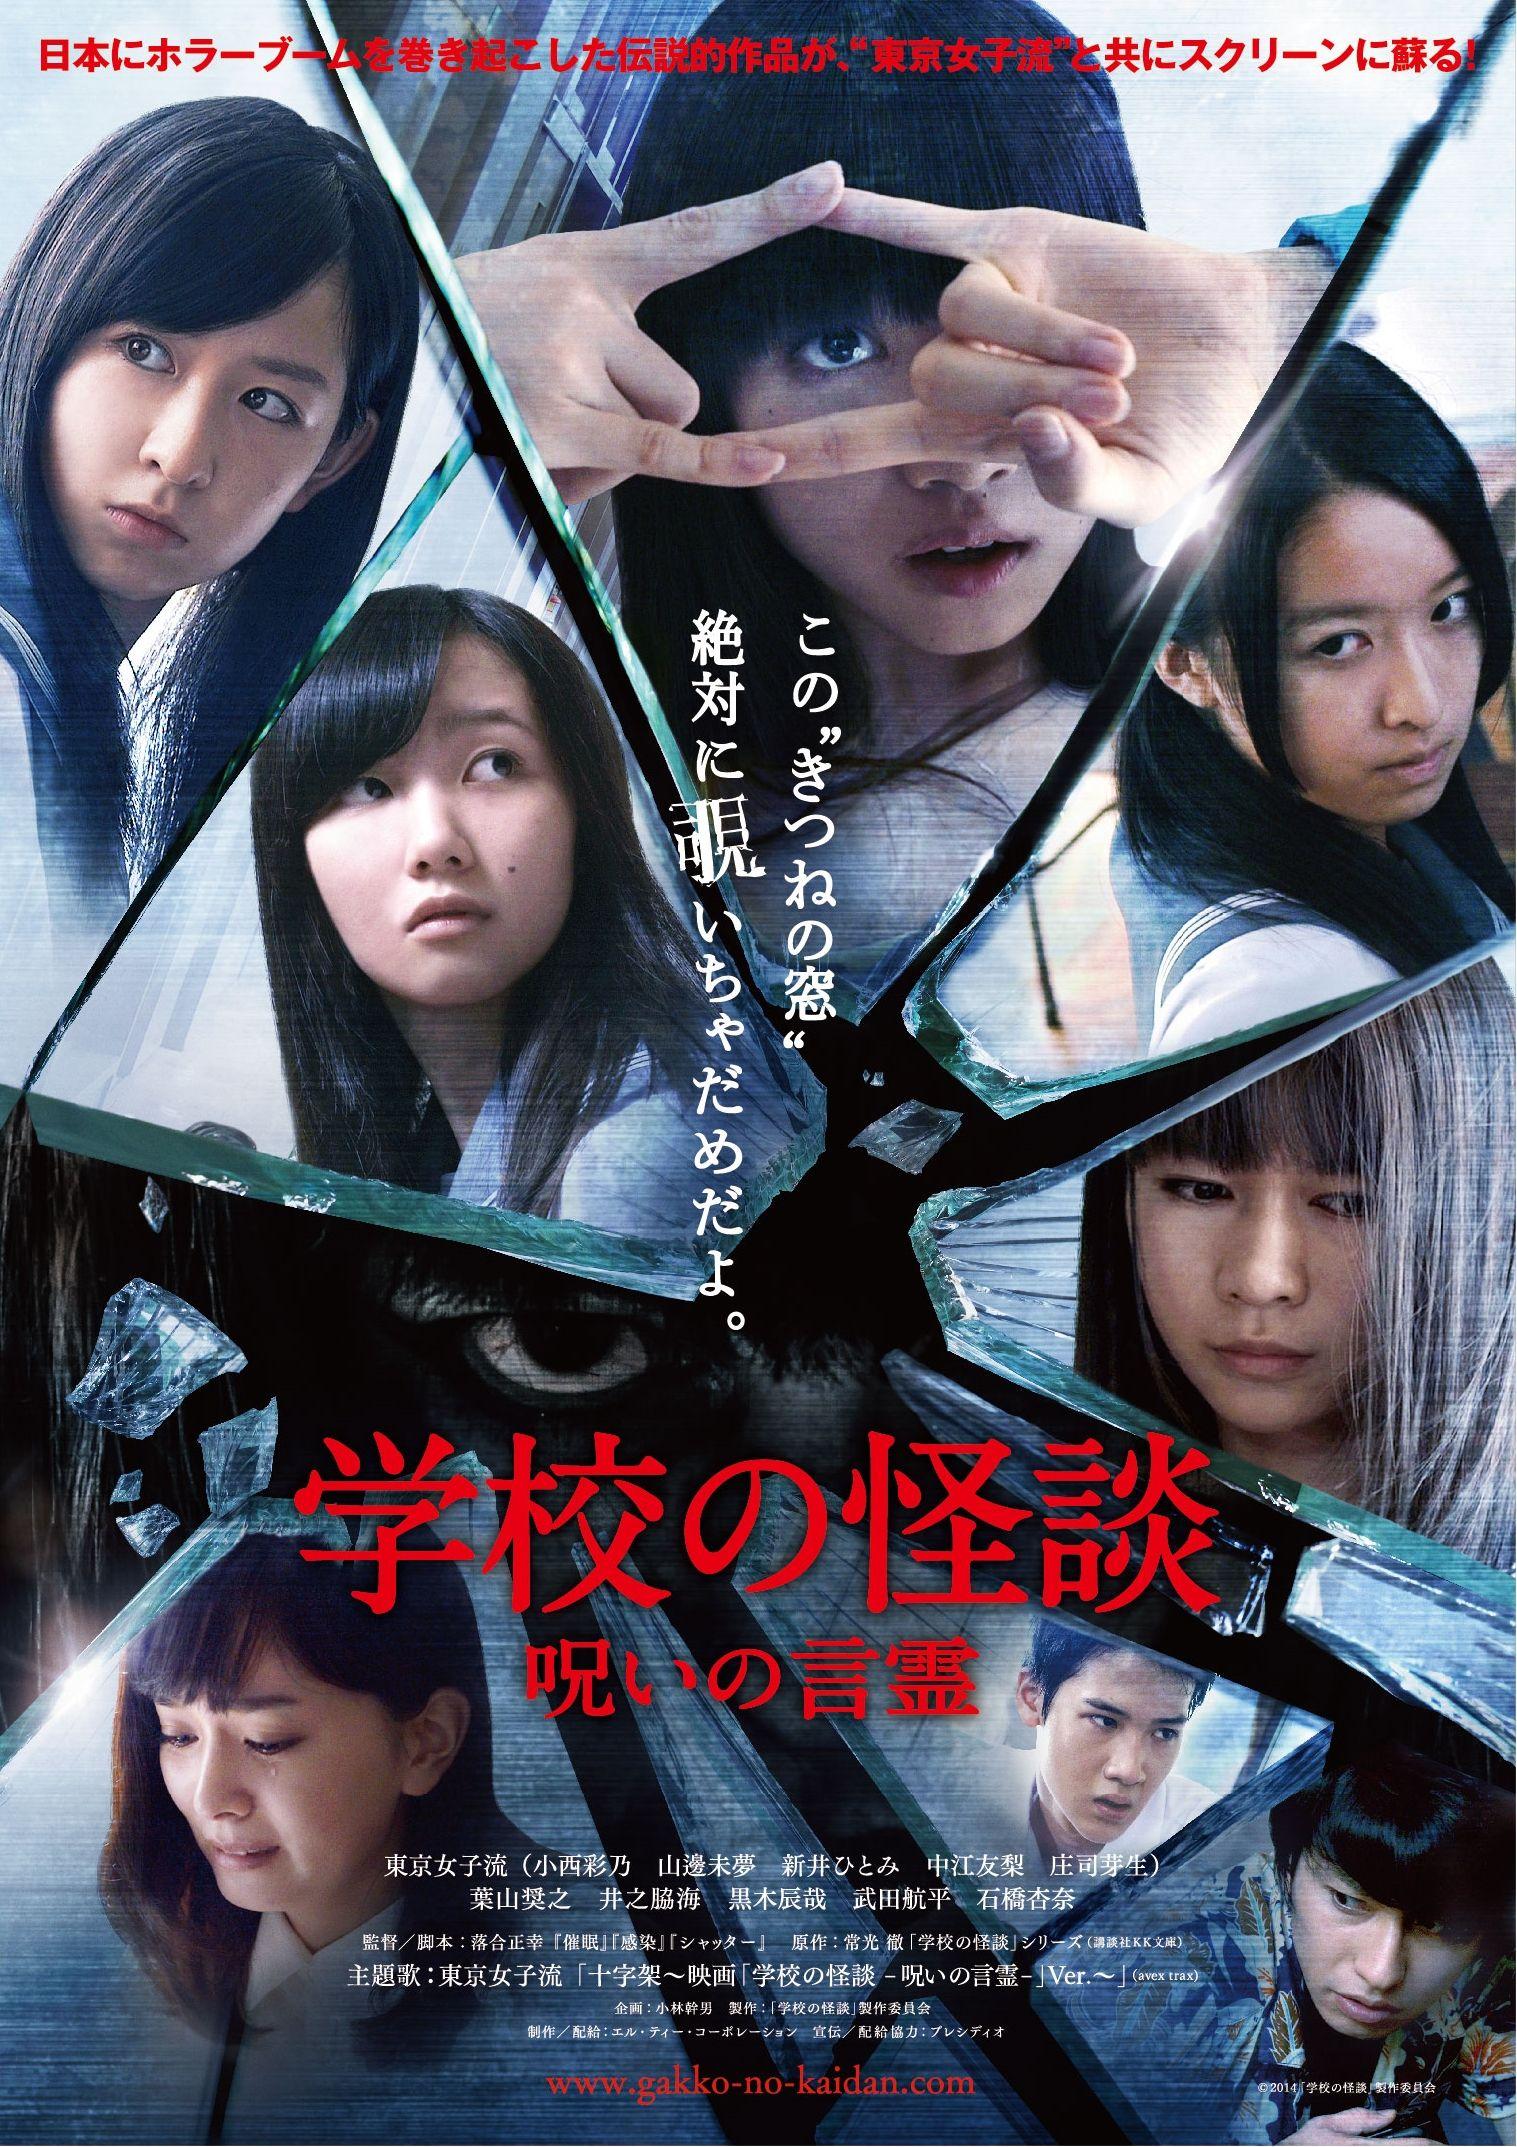 Sinopsis: Download Japanese Movie Kotodama: Spiritual Curse (2014